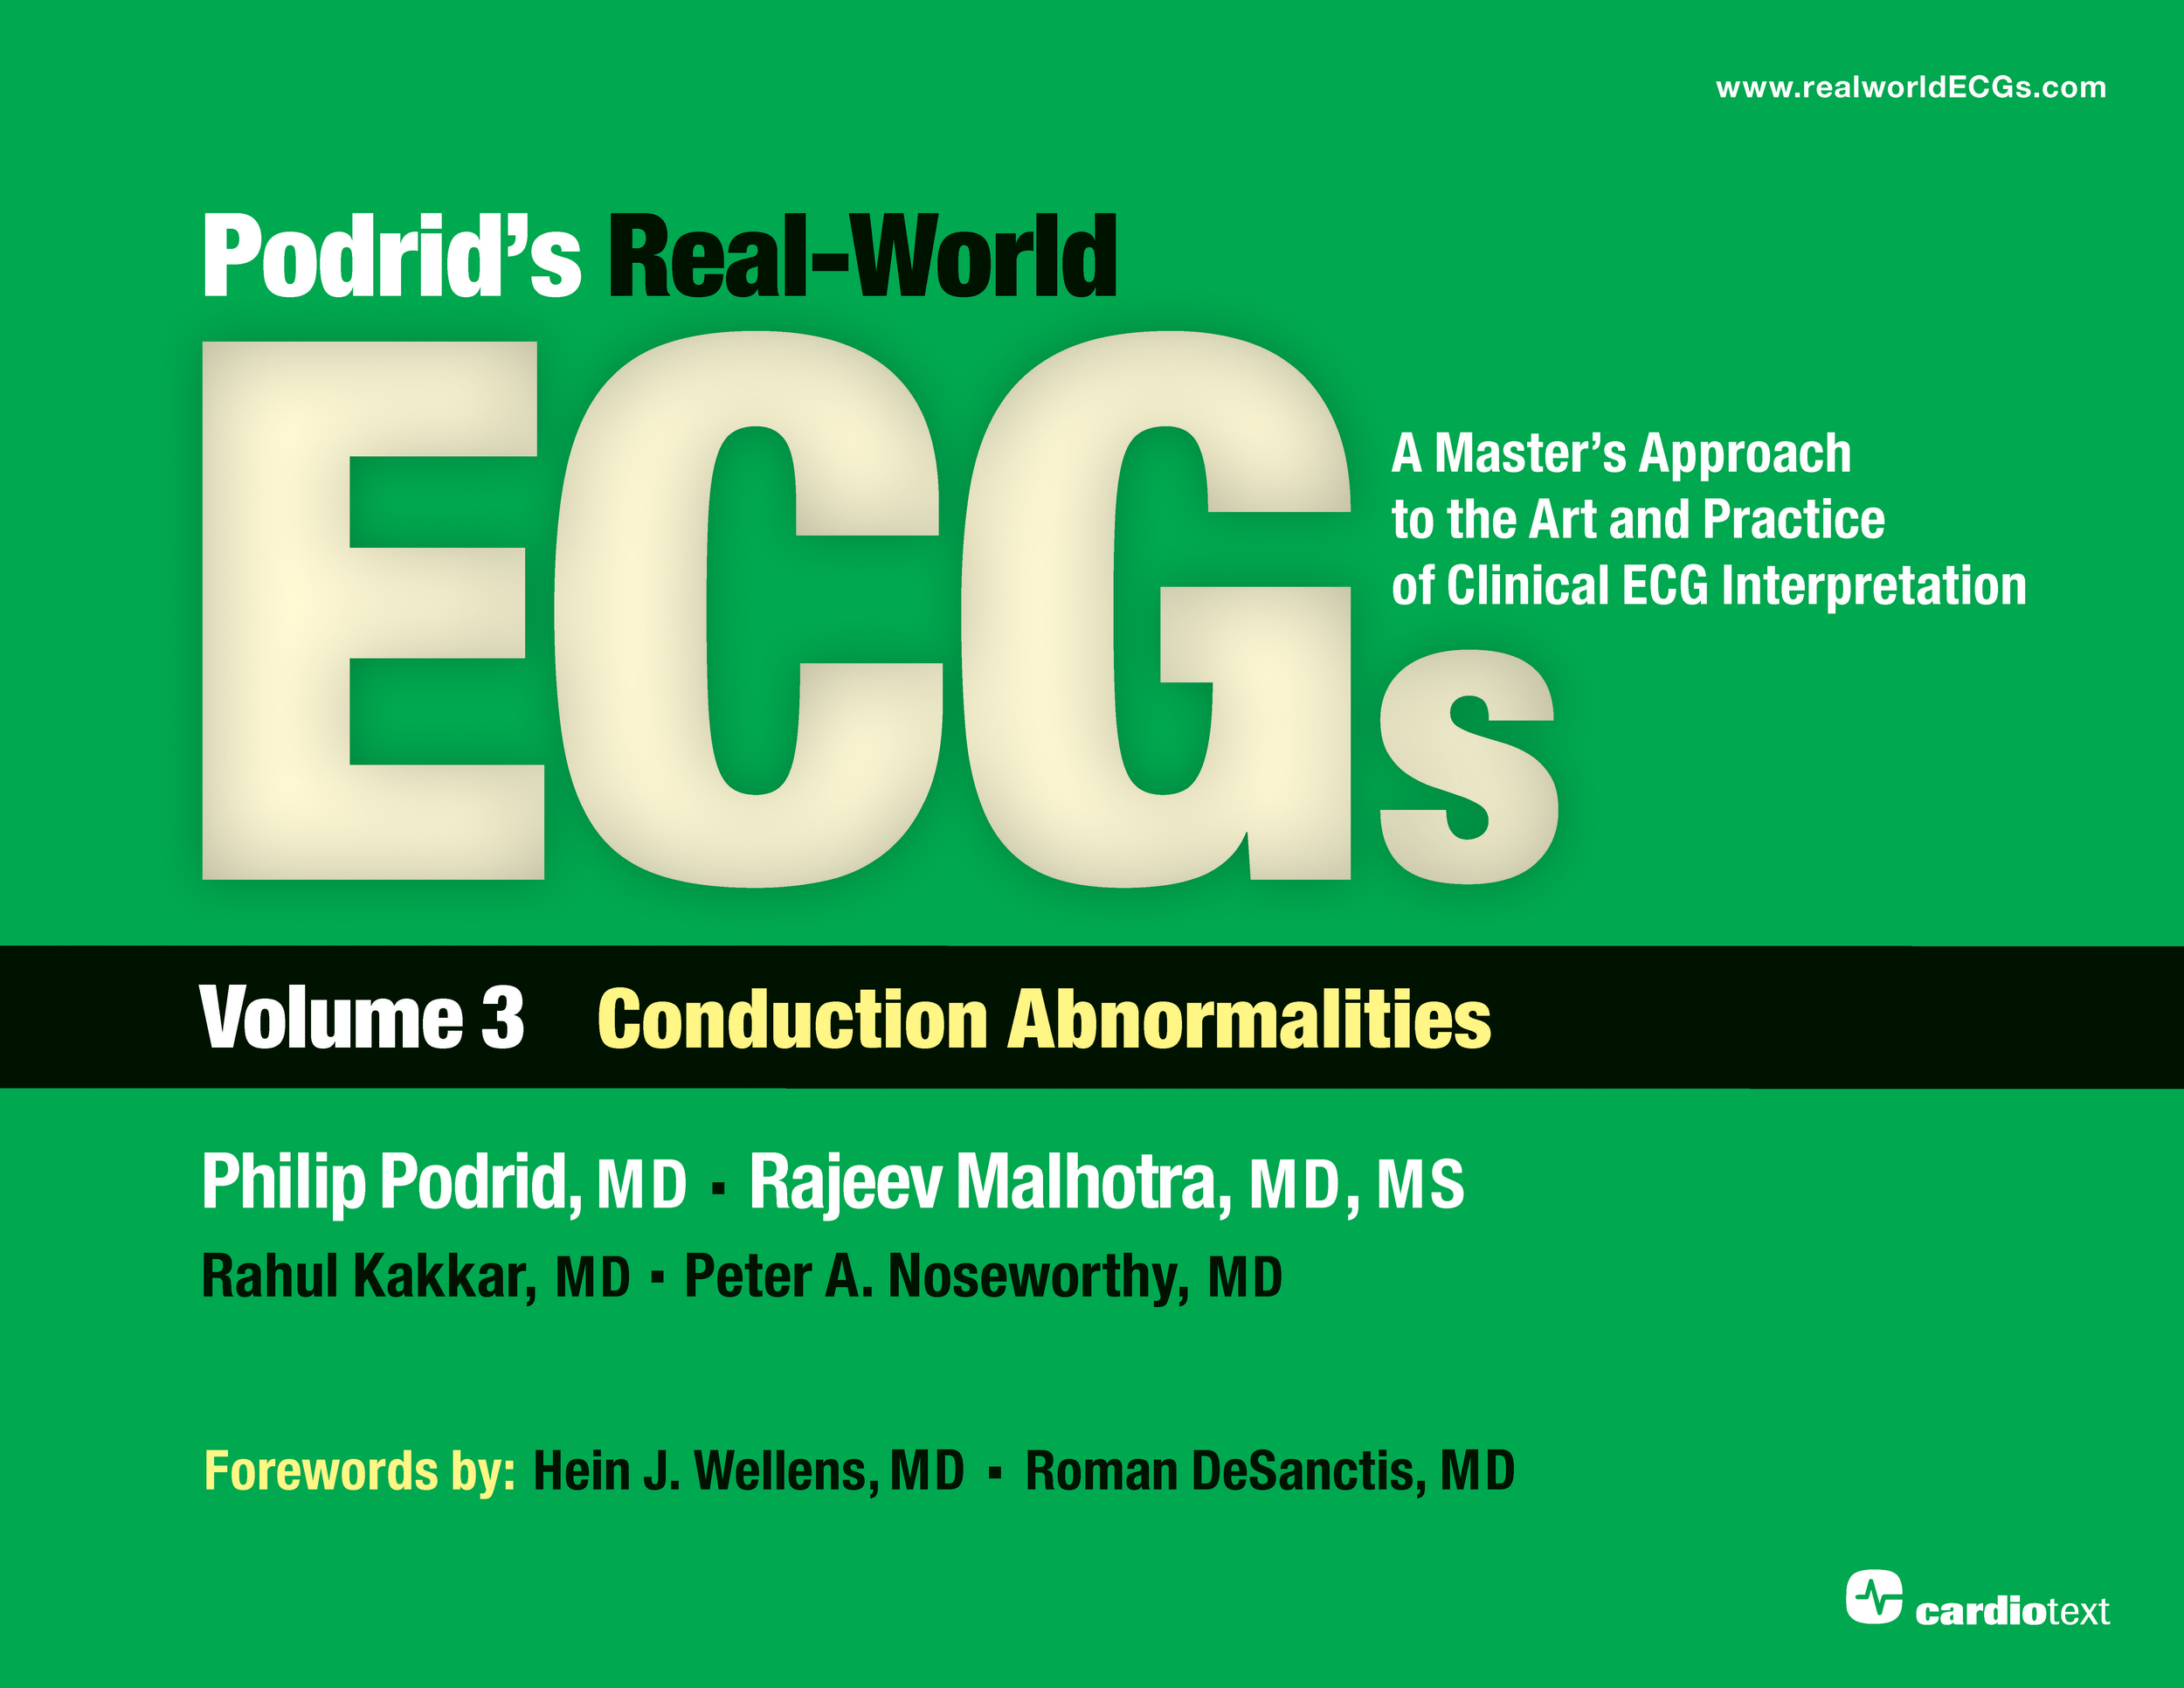 Podrid's Real-World ECGs Volume 3